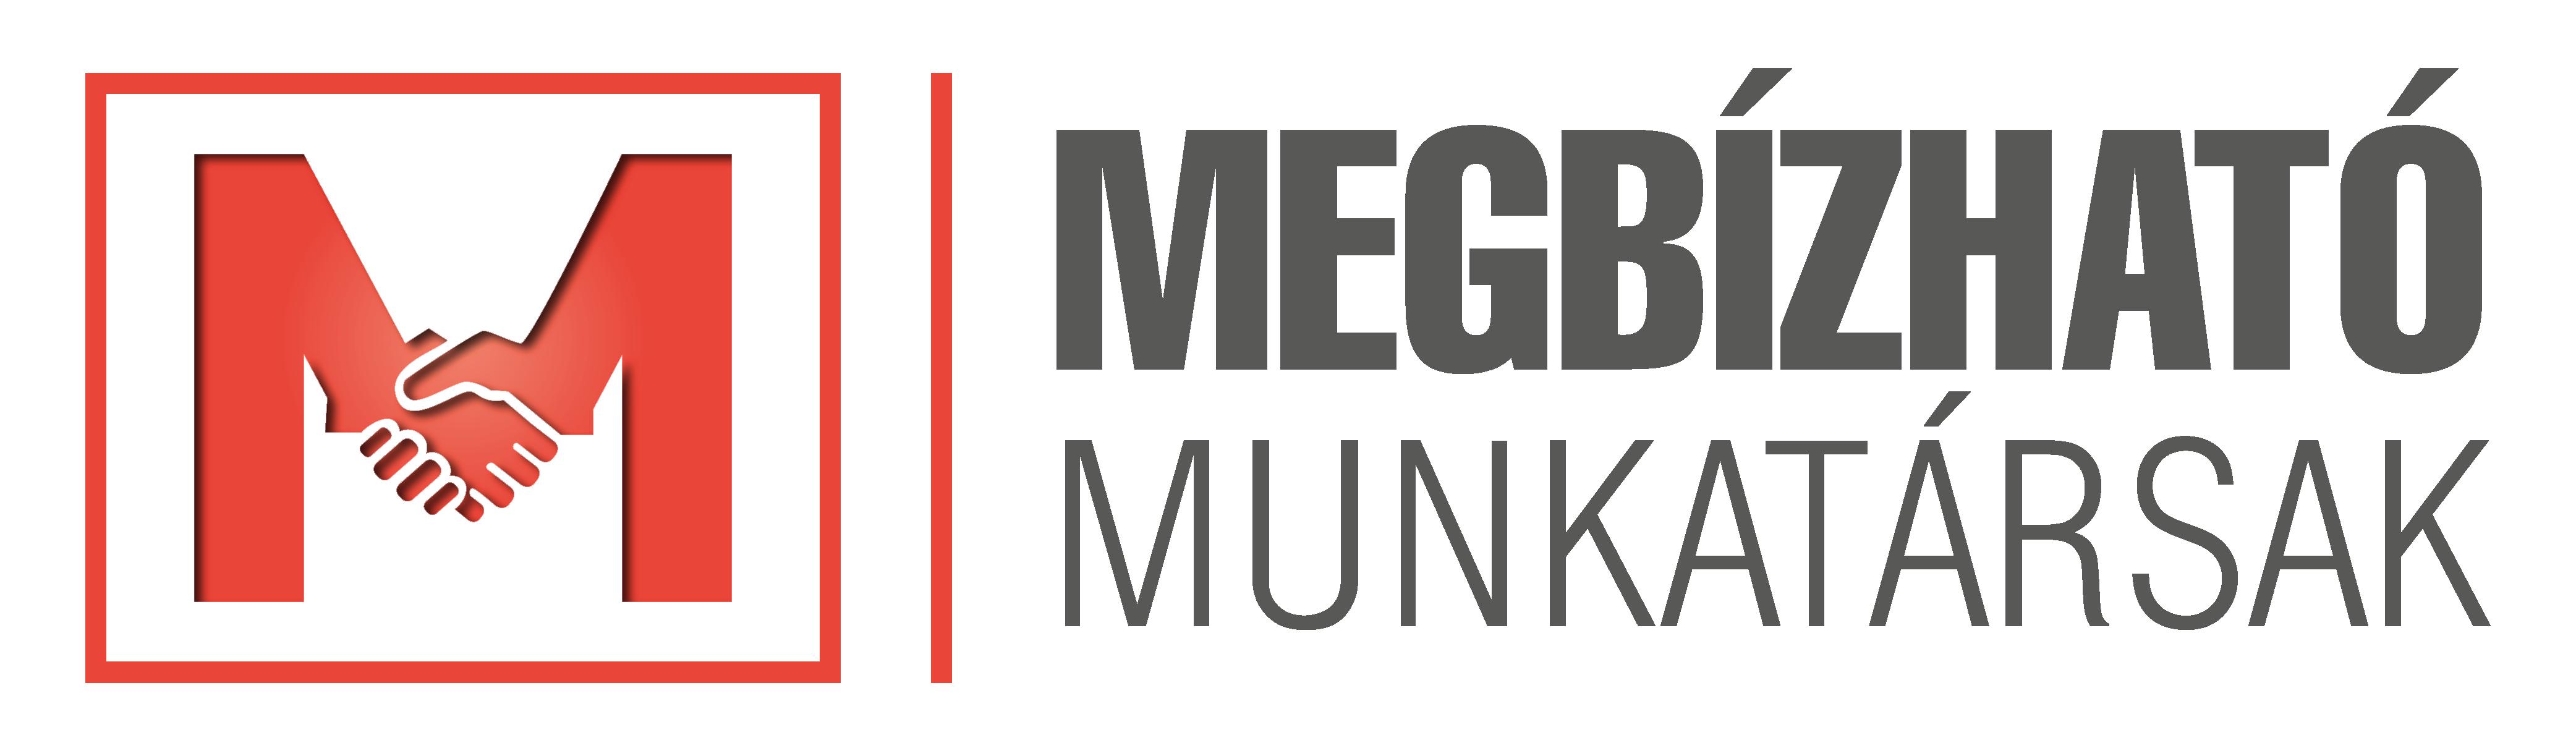 megbizhatomunkatarsak logo